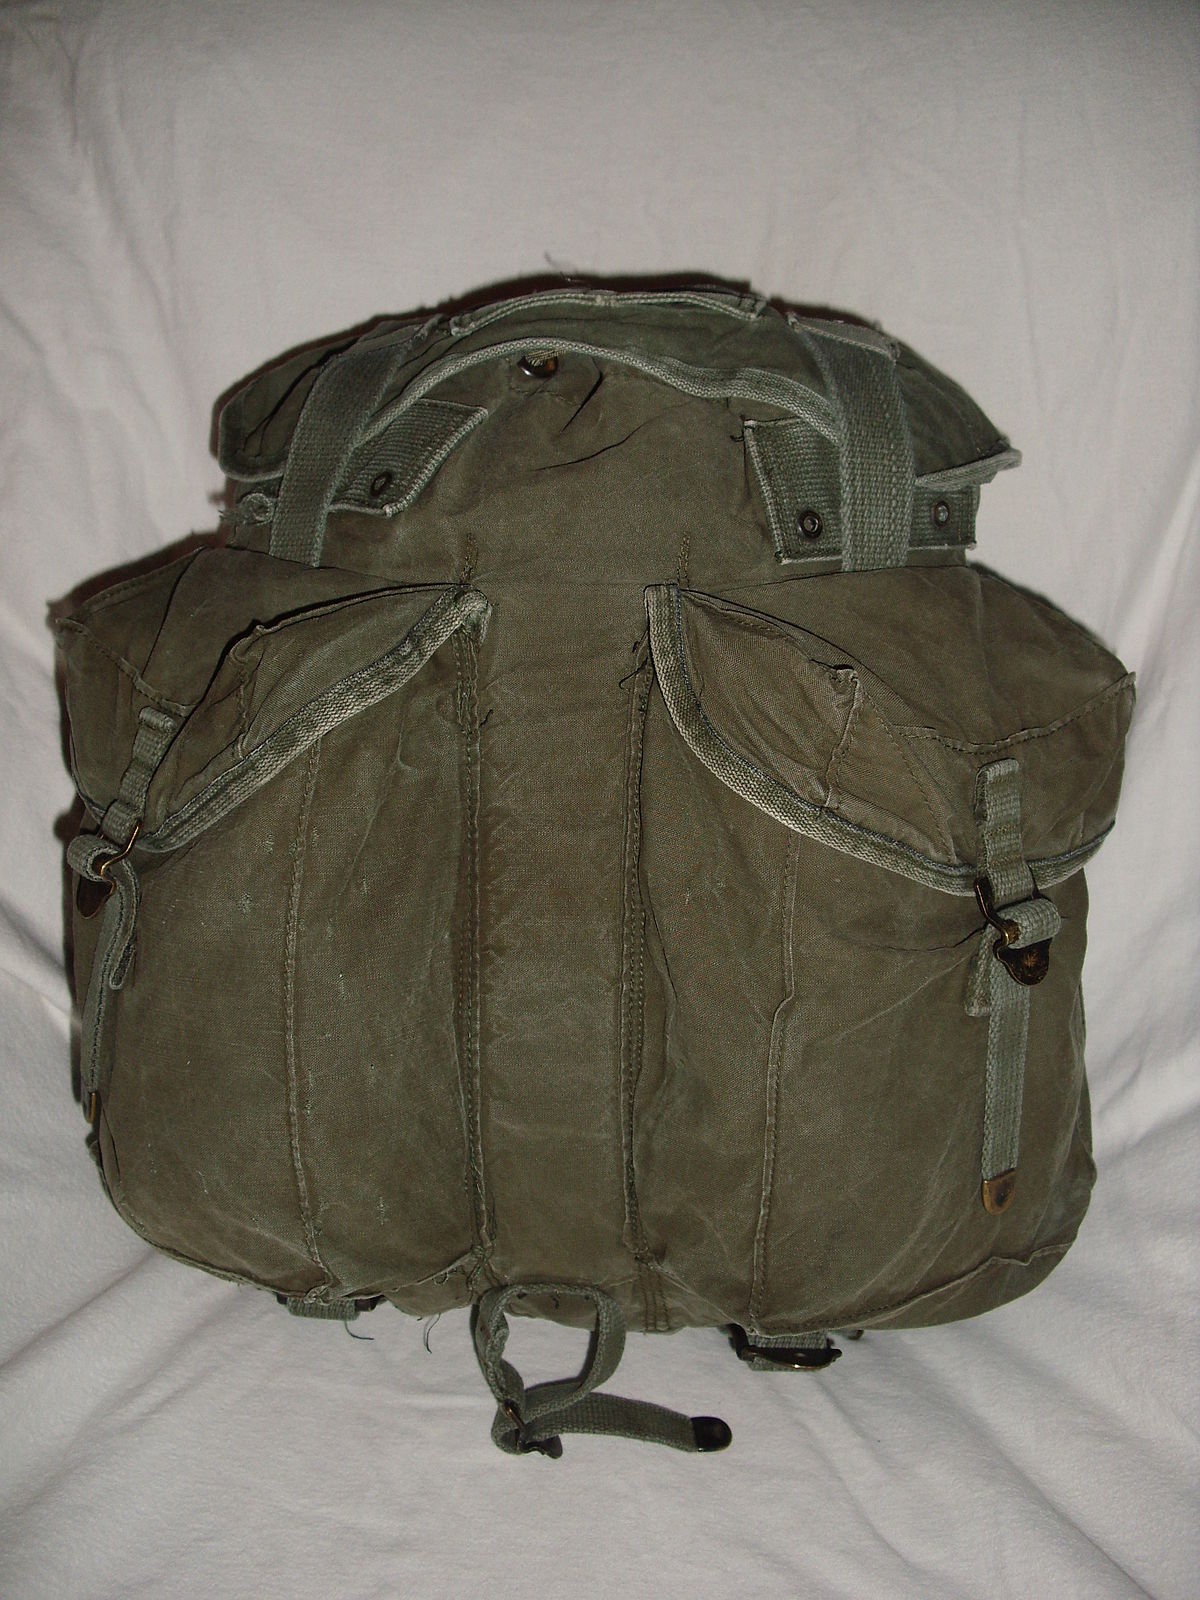 ARVN-Rucksack – Wikipedia